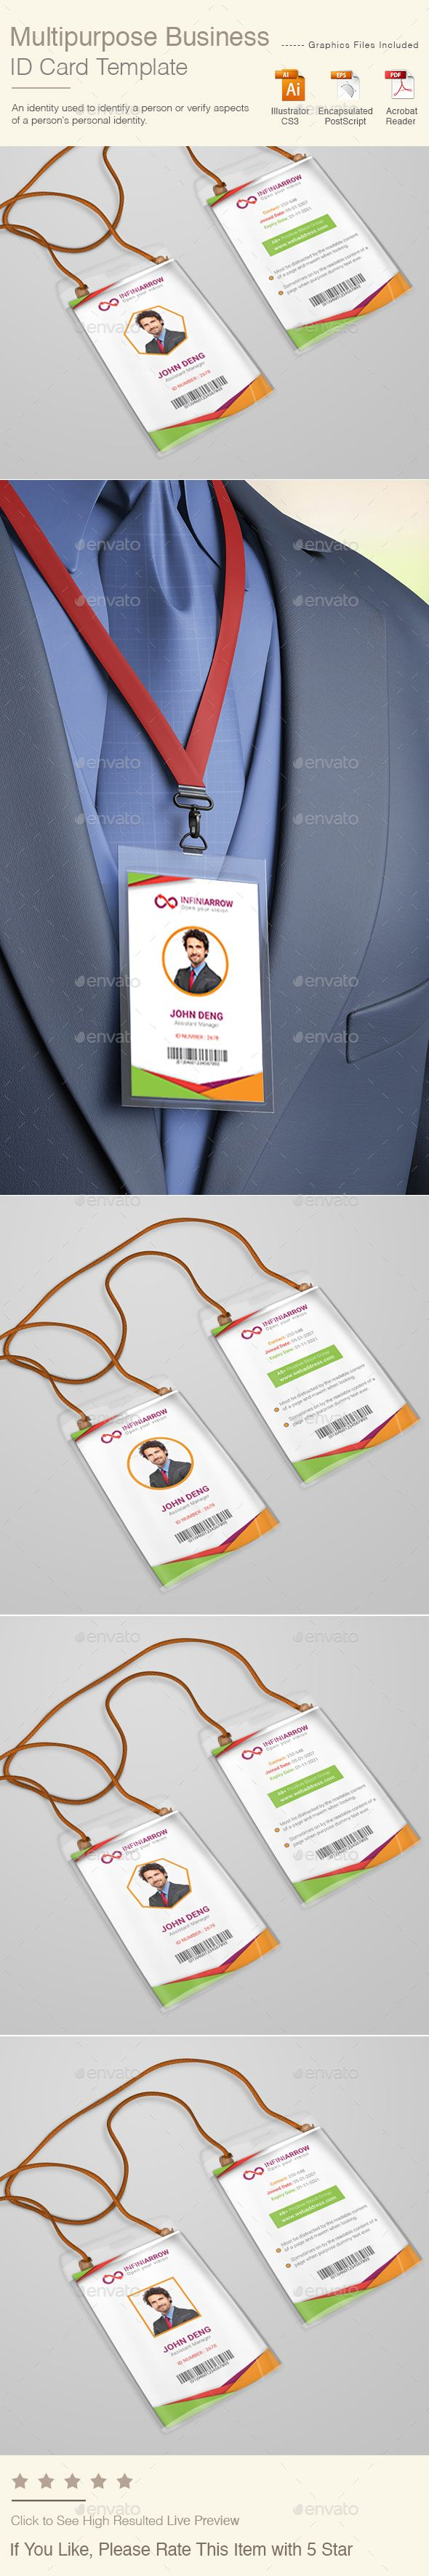 Multipurpose Business ID Card Template